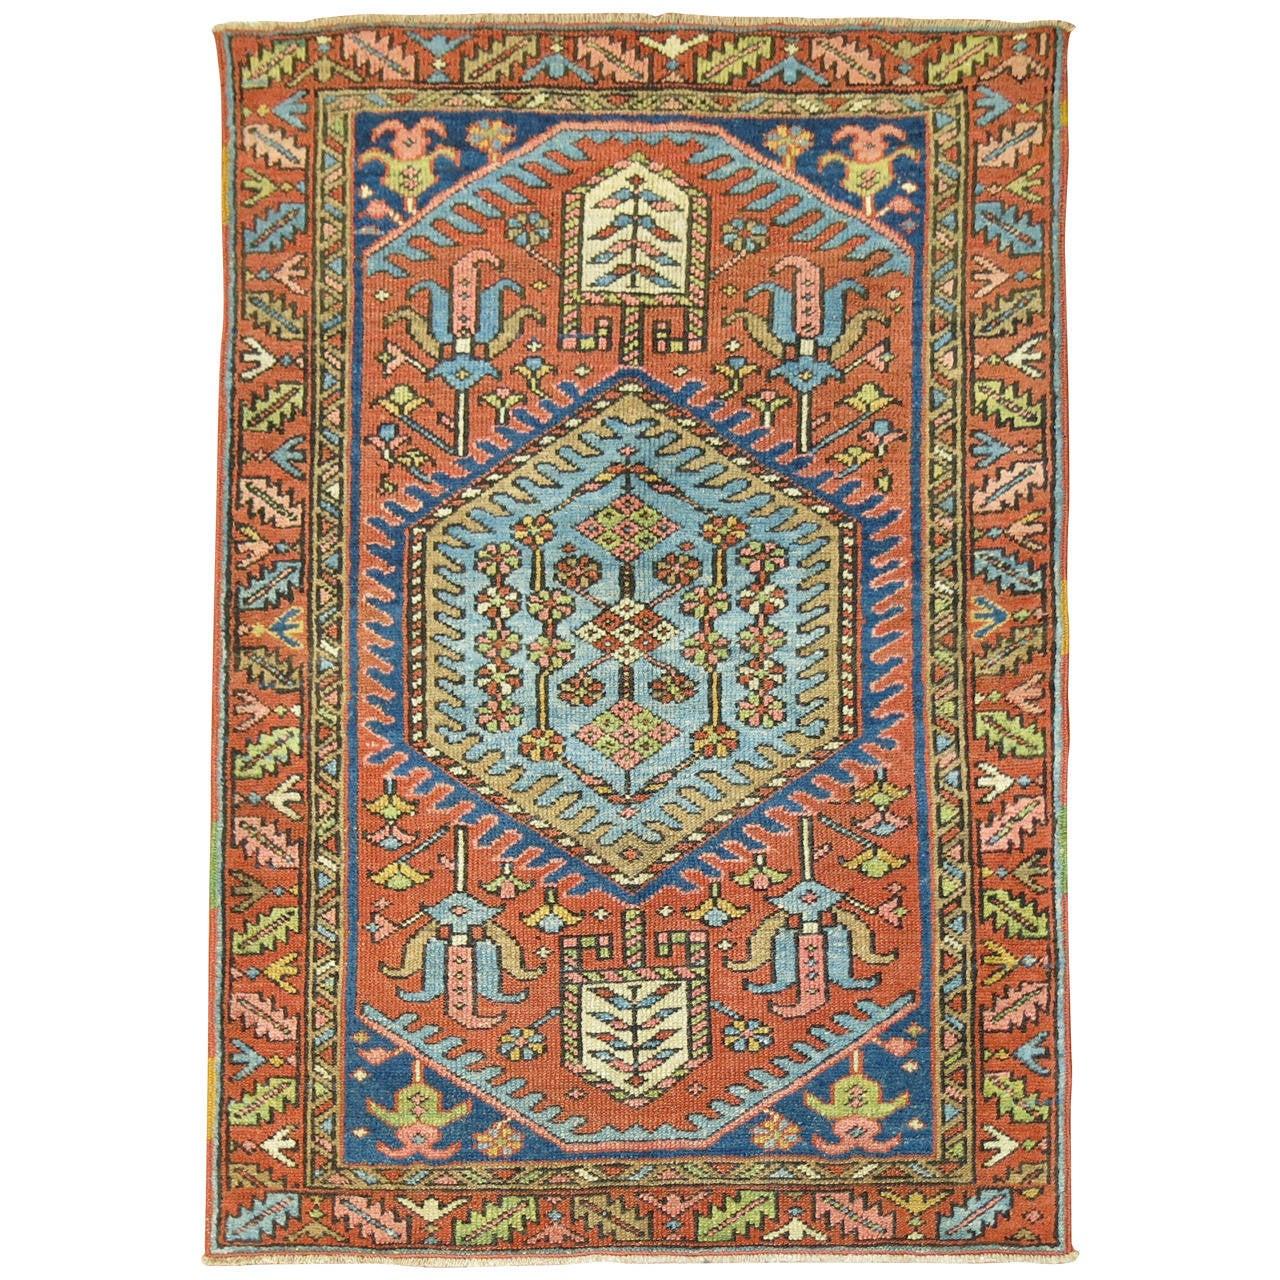 Vintage Throw Rugs: Antique Persian Heriz Serapi Throw Rug At 1stdibs